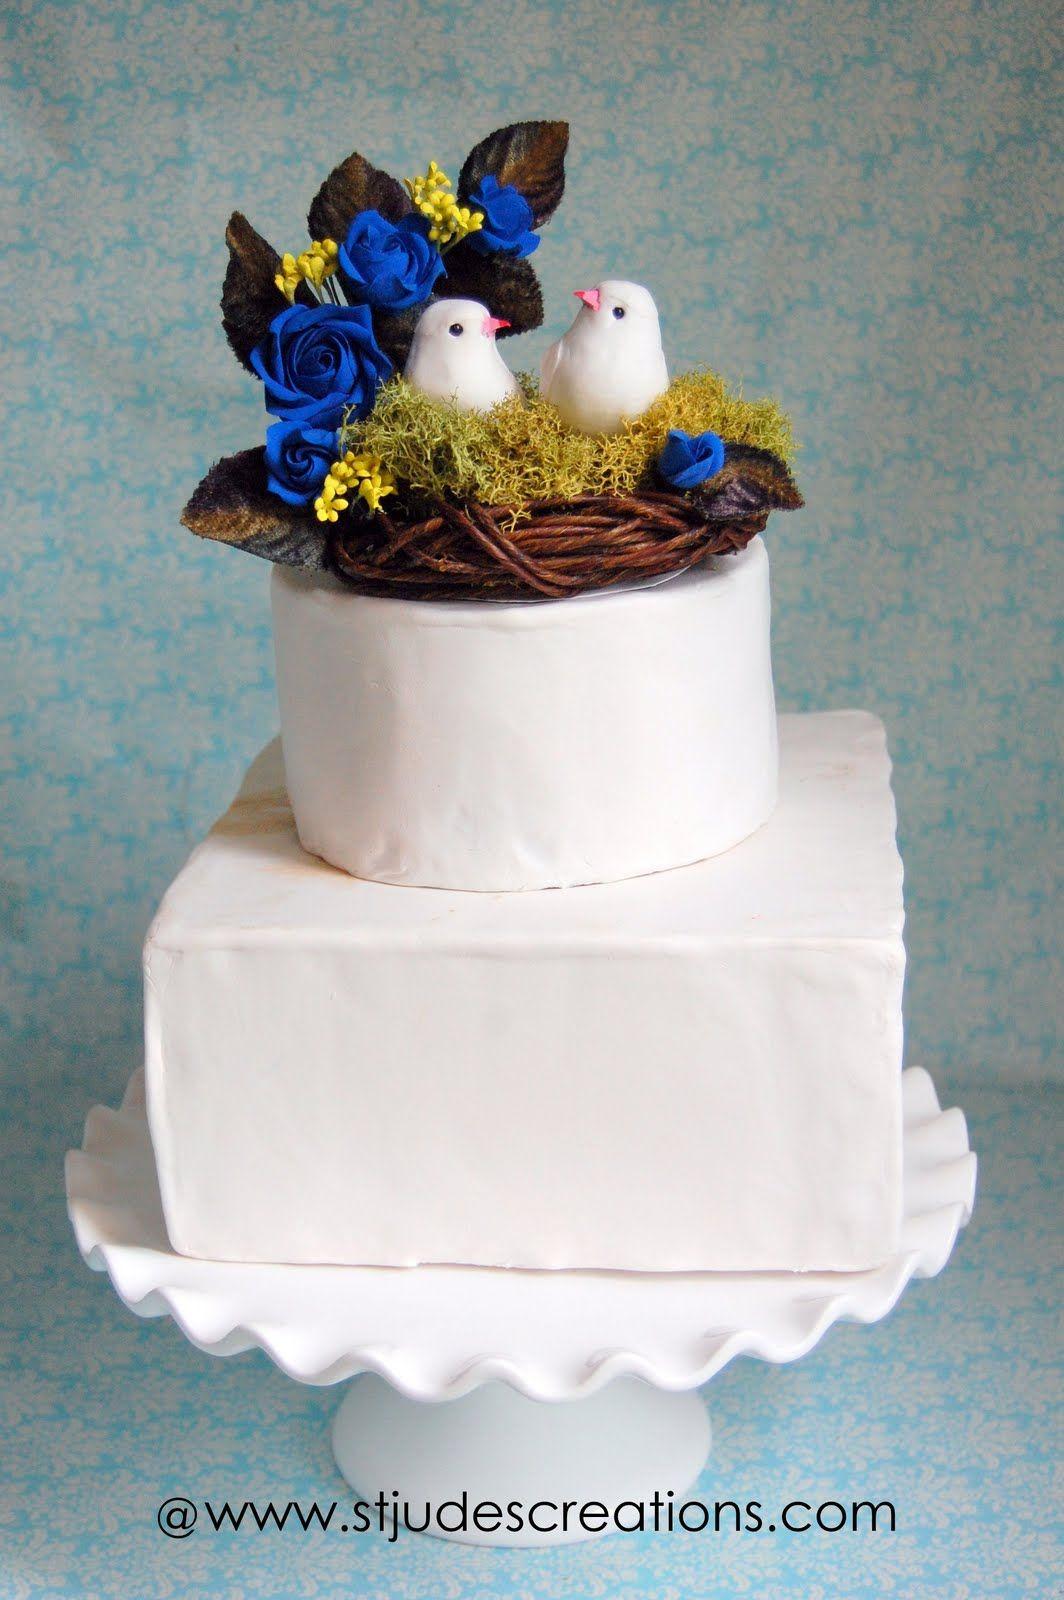 royal blue wedding cake - Bing Images | Wedding Planning Ideas for ...